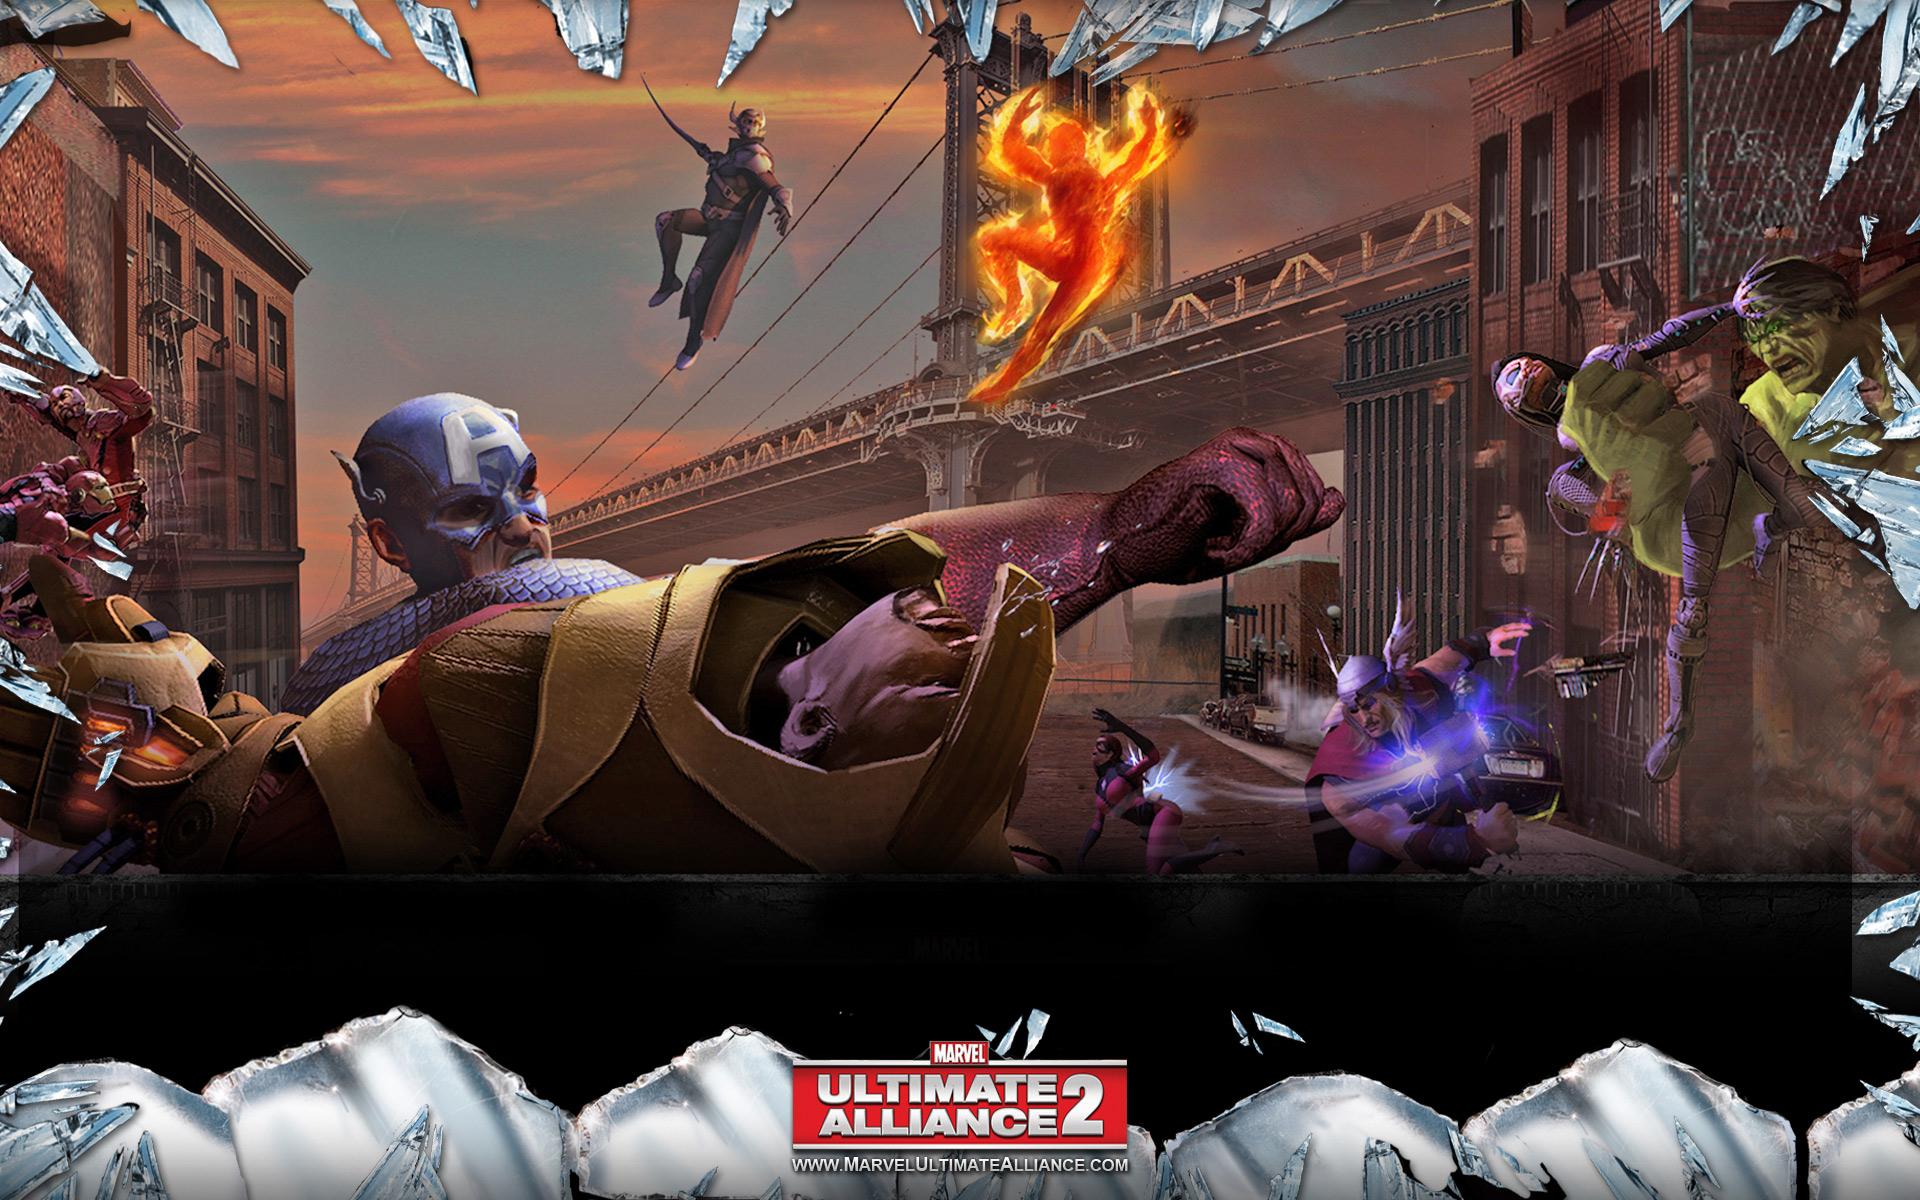 wallpaper alliance ultimate - photo #14